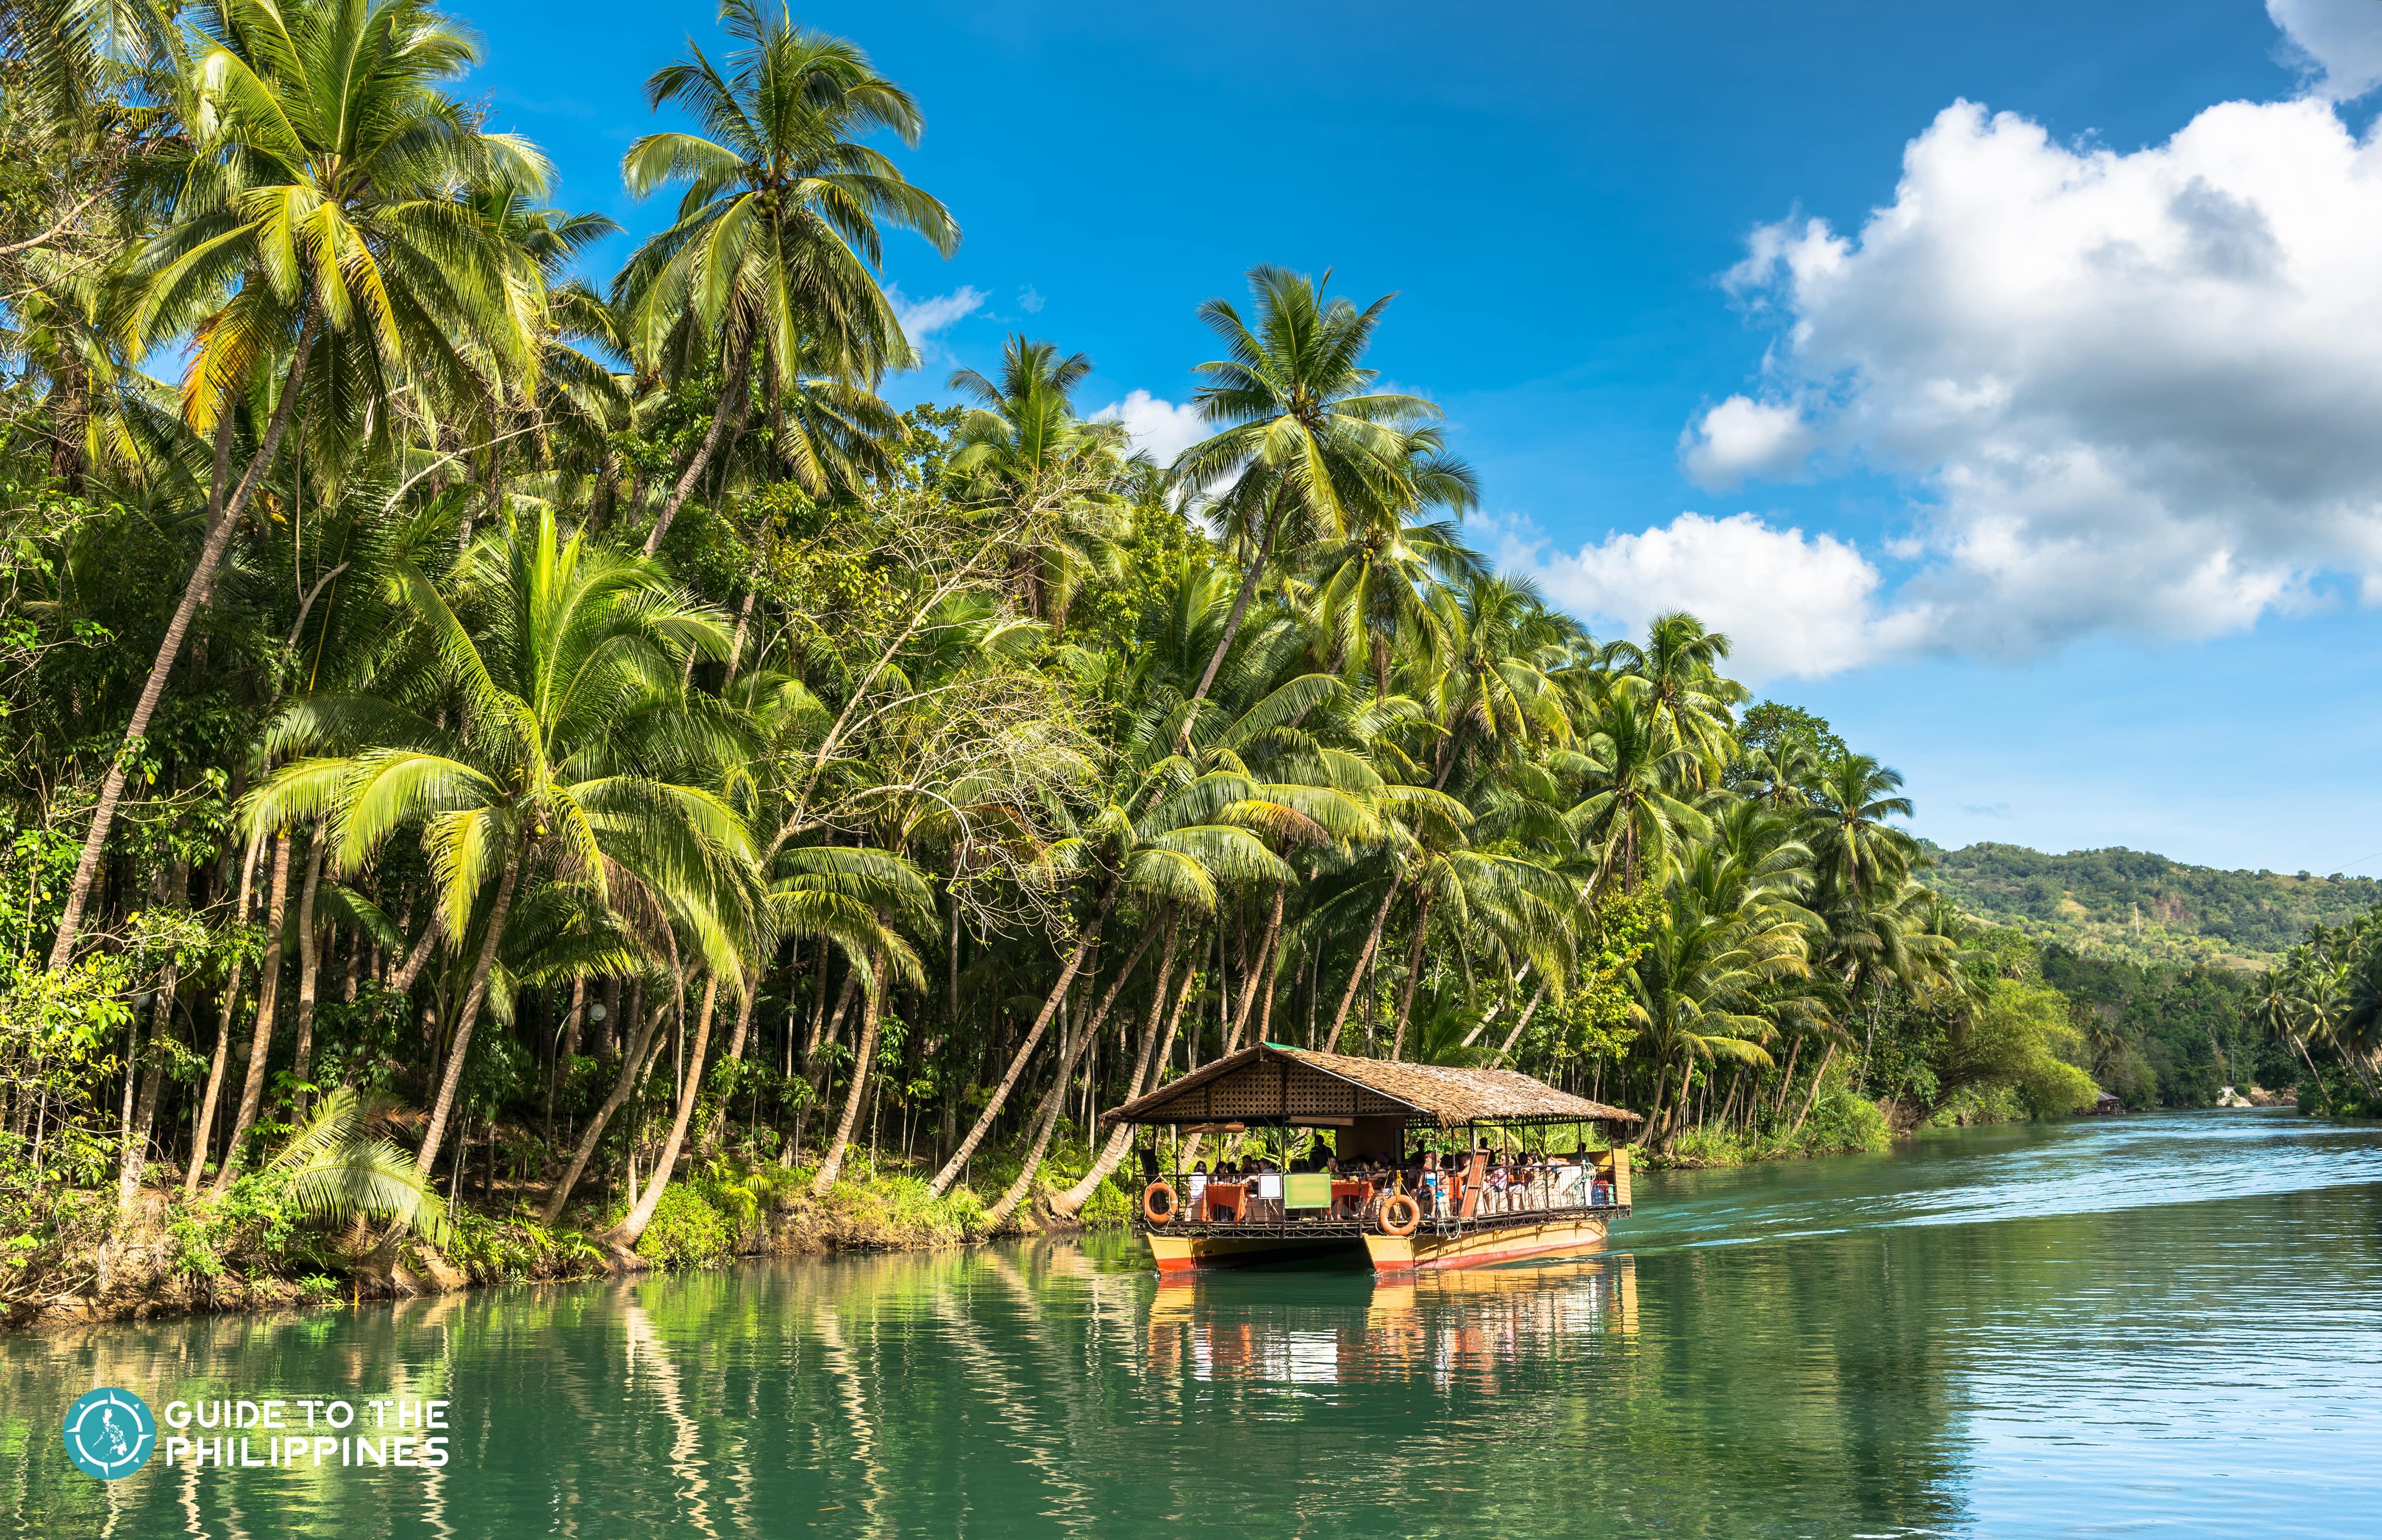 Loboc River Cruise experience in Bohol